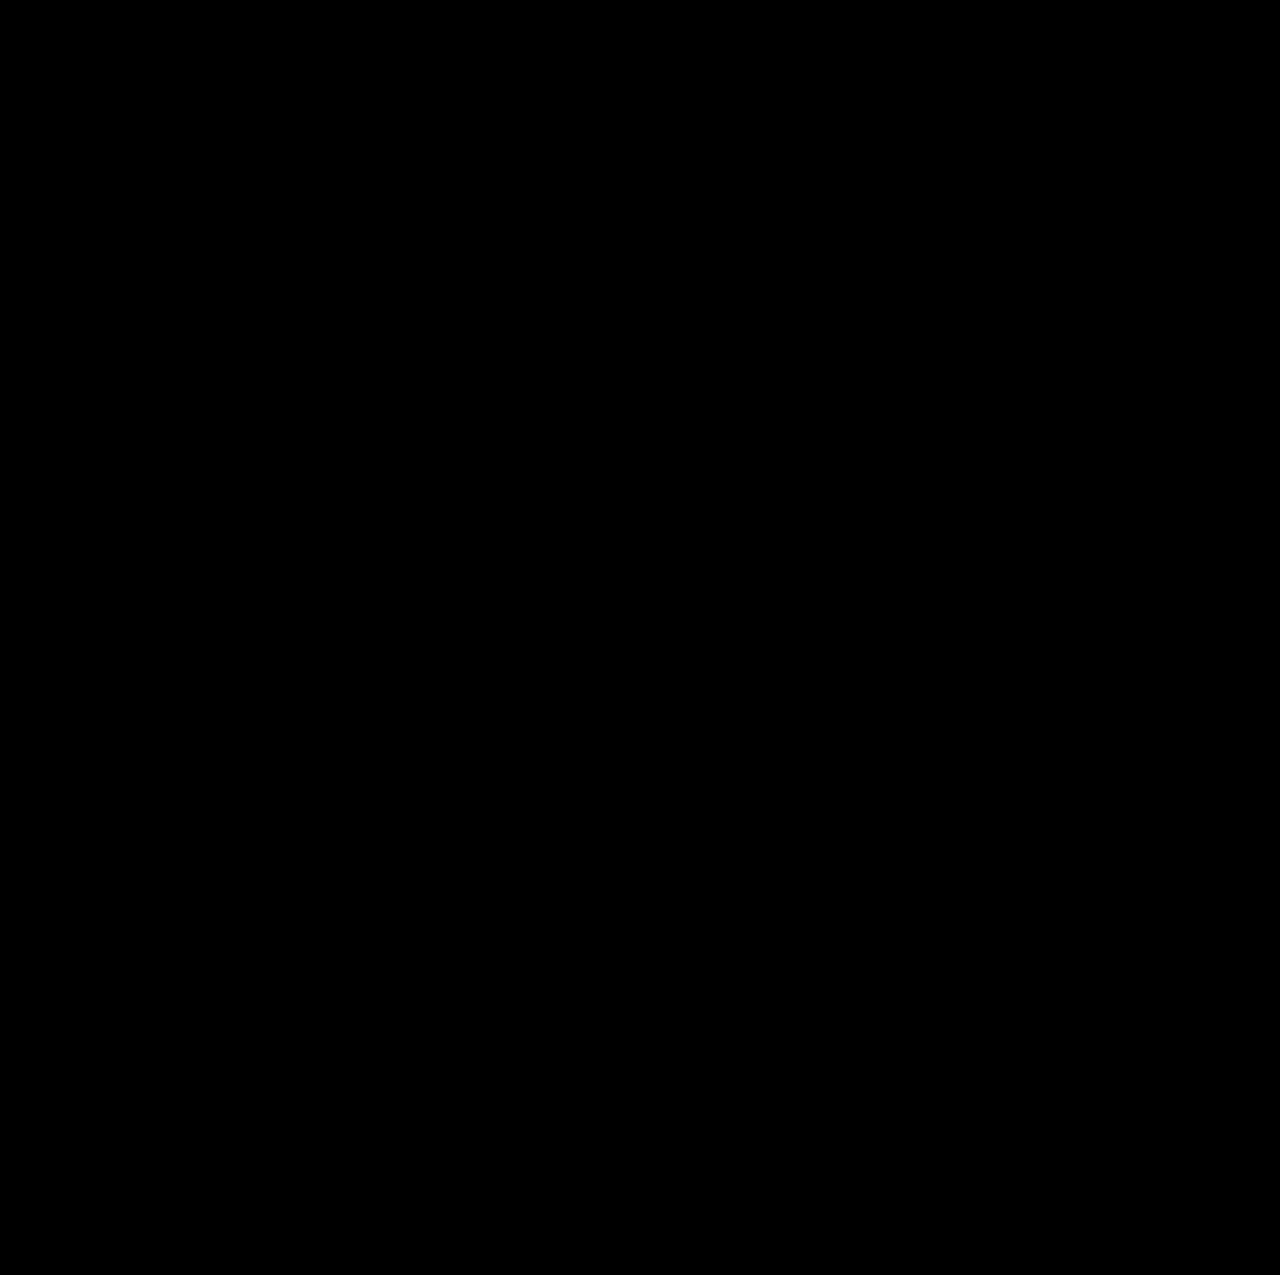 picture transparent Trumpet instrument music cartoon. Vector angel cherub